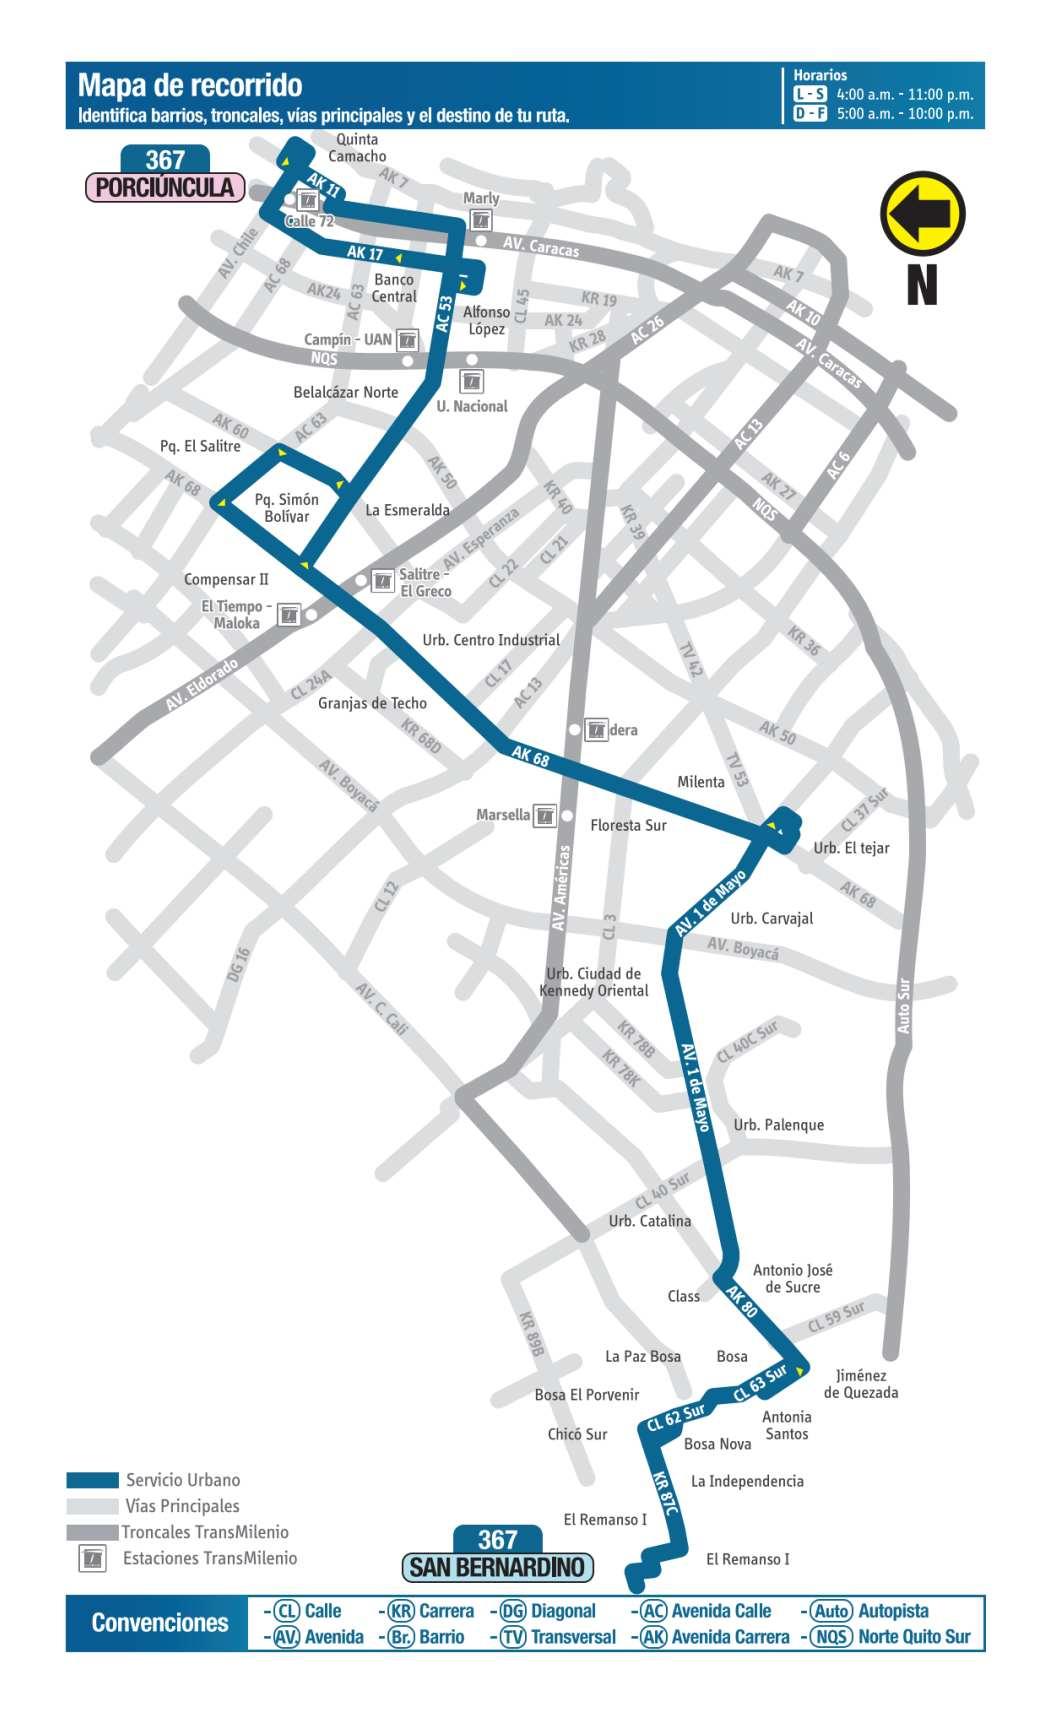 367 Porciúncula - San Bernardino, mapa bus urbano Bogotá